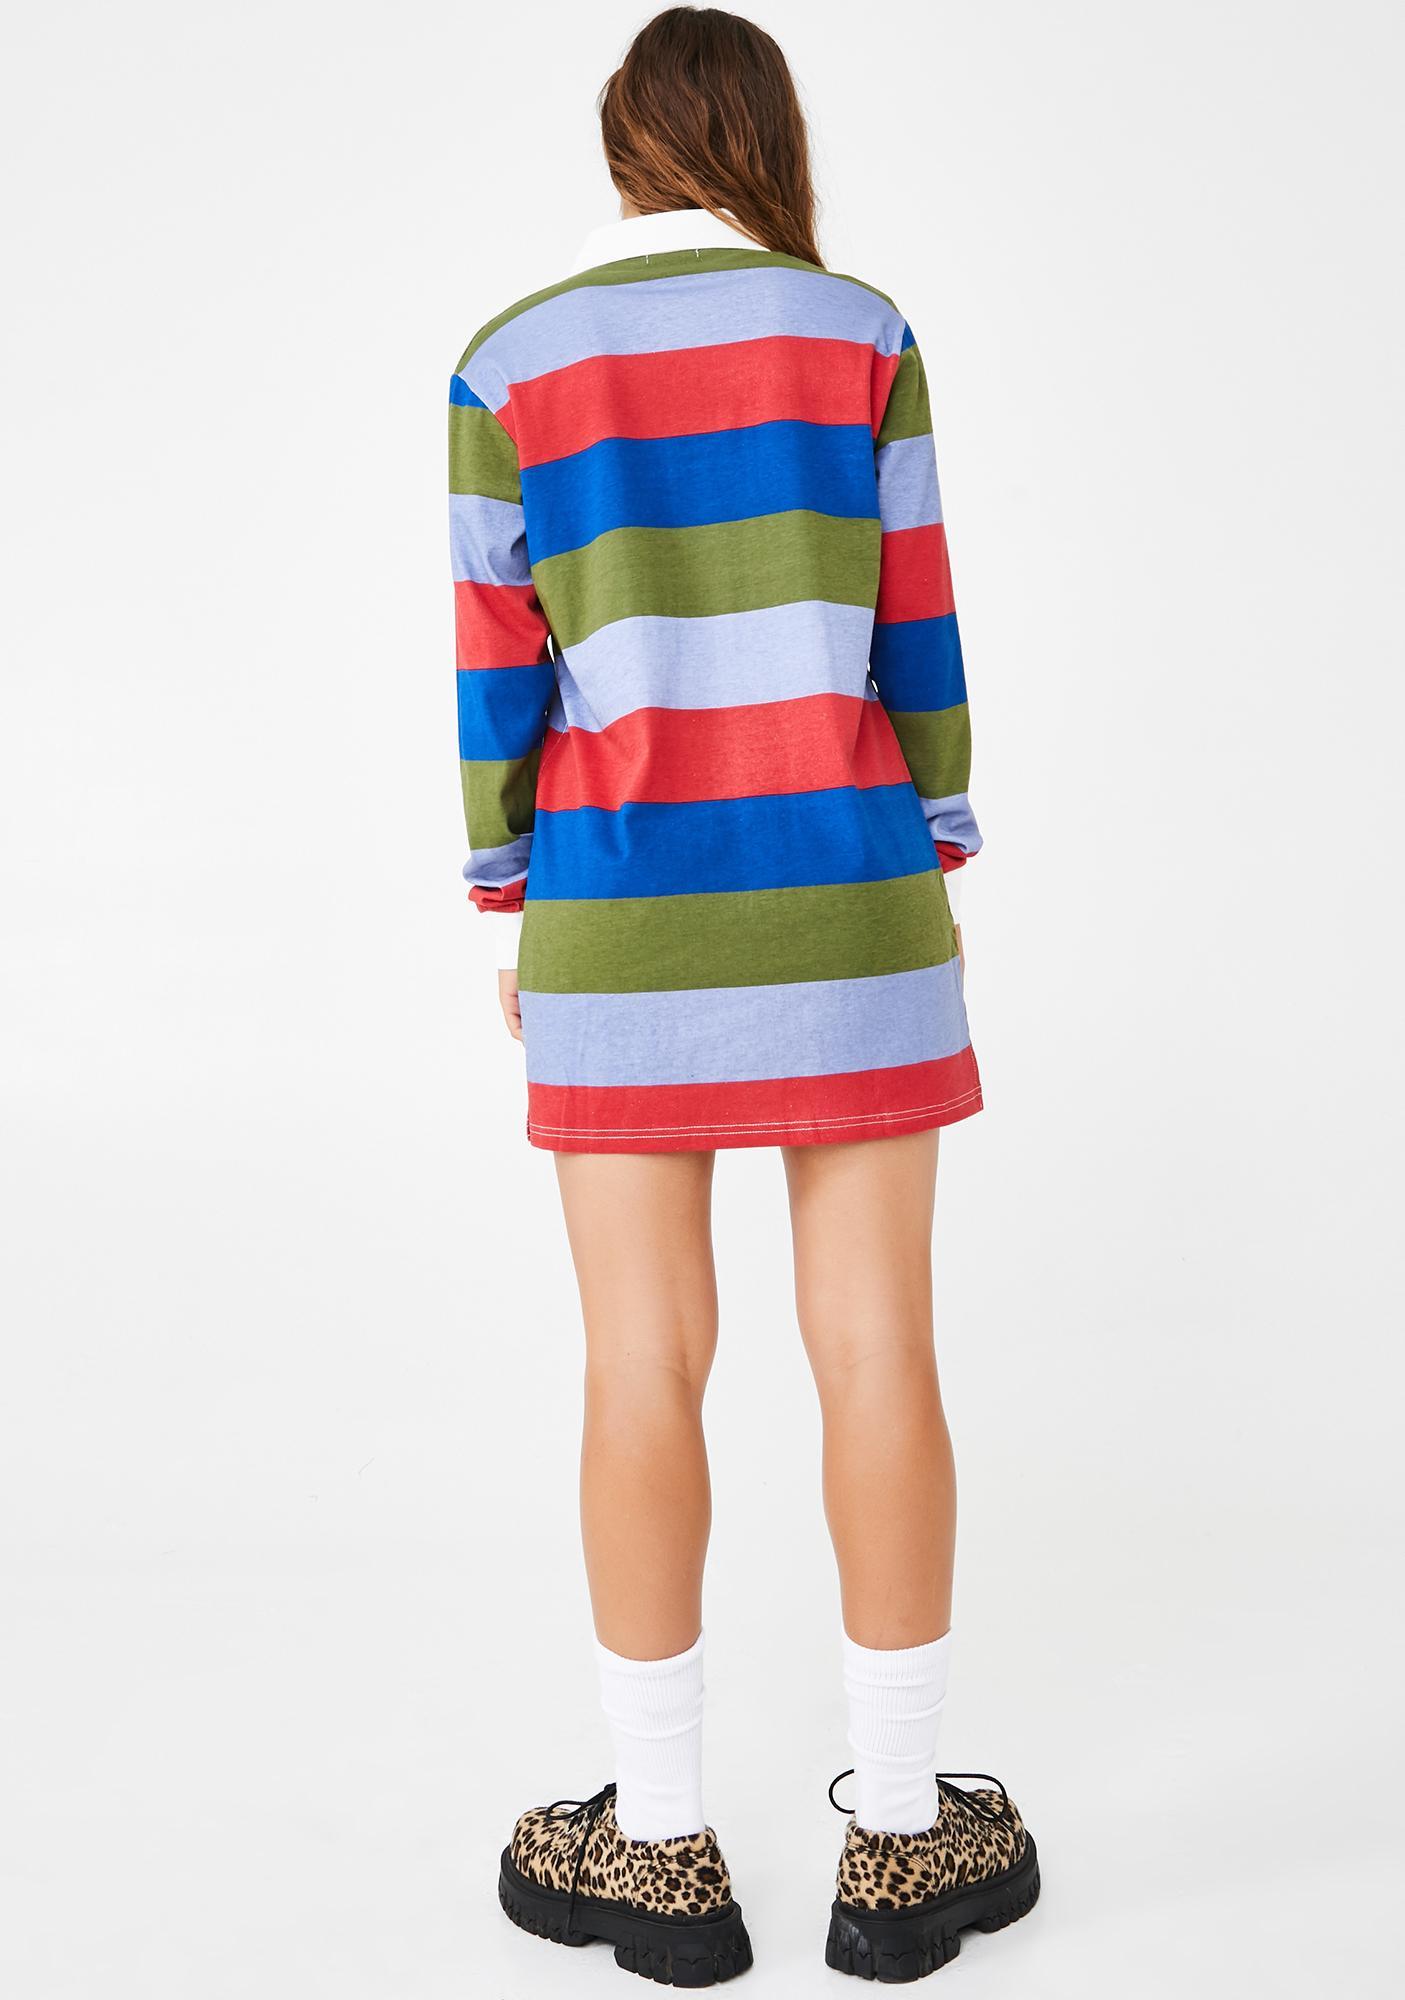 dELiA*s by Dolls Kill Lounge Hound Shirt Dress